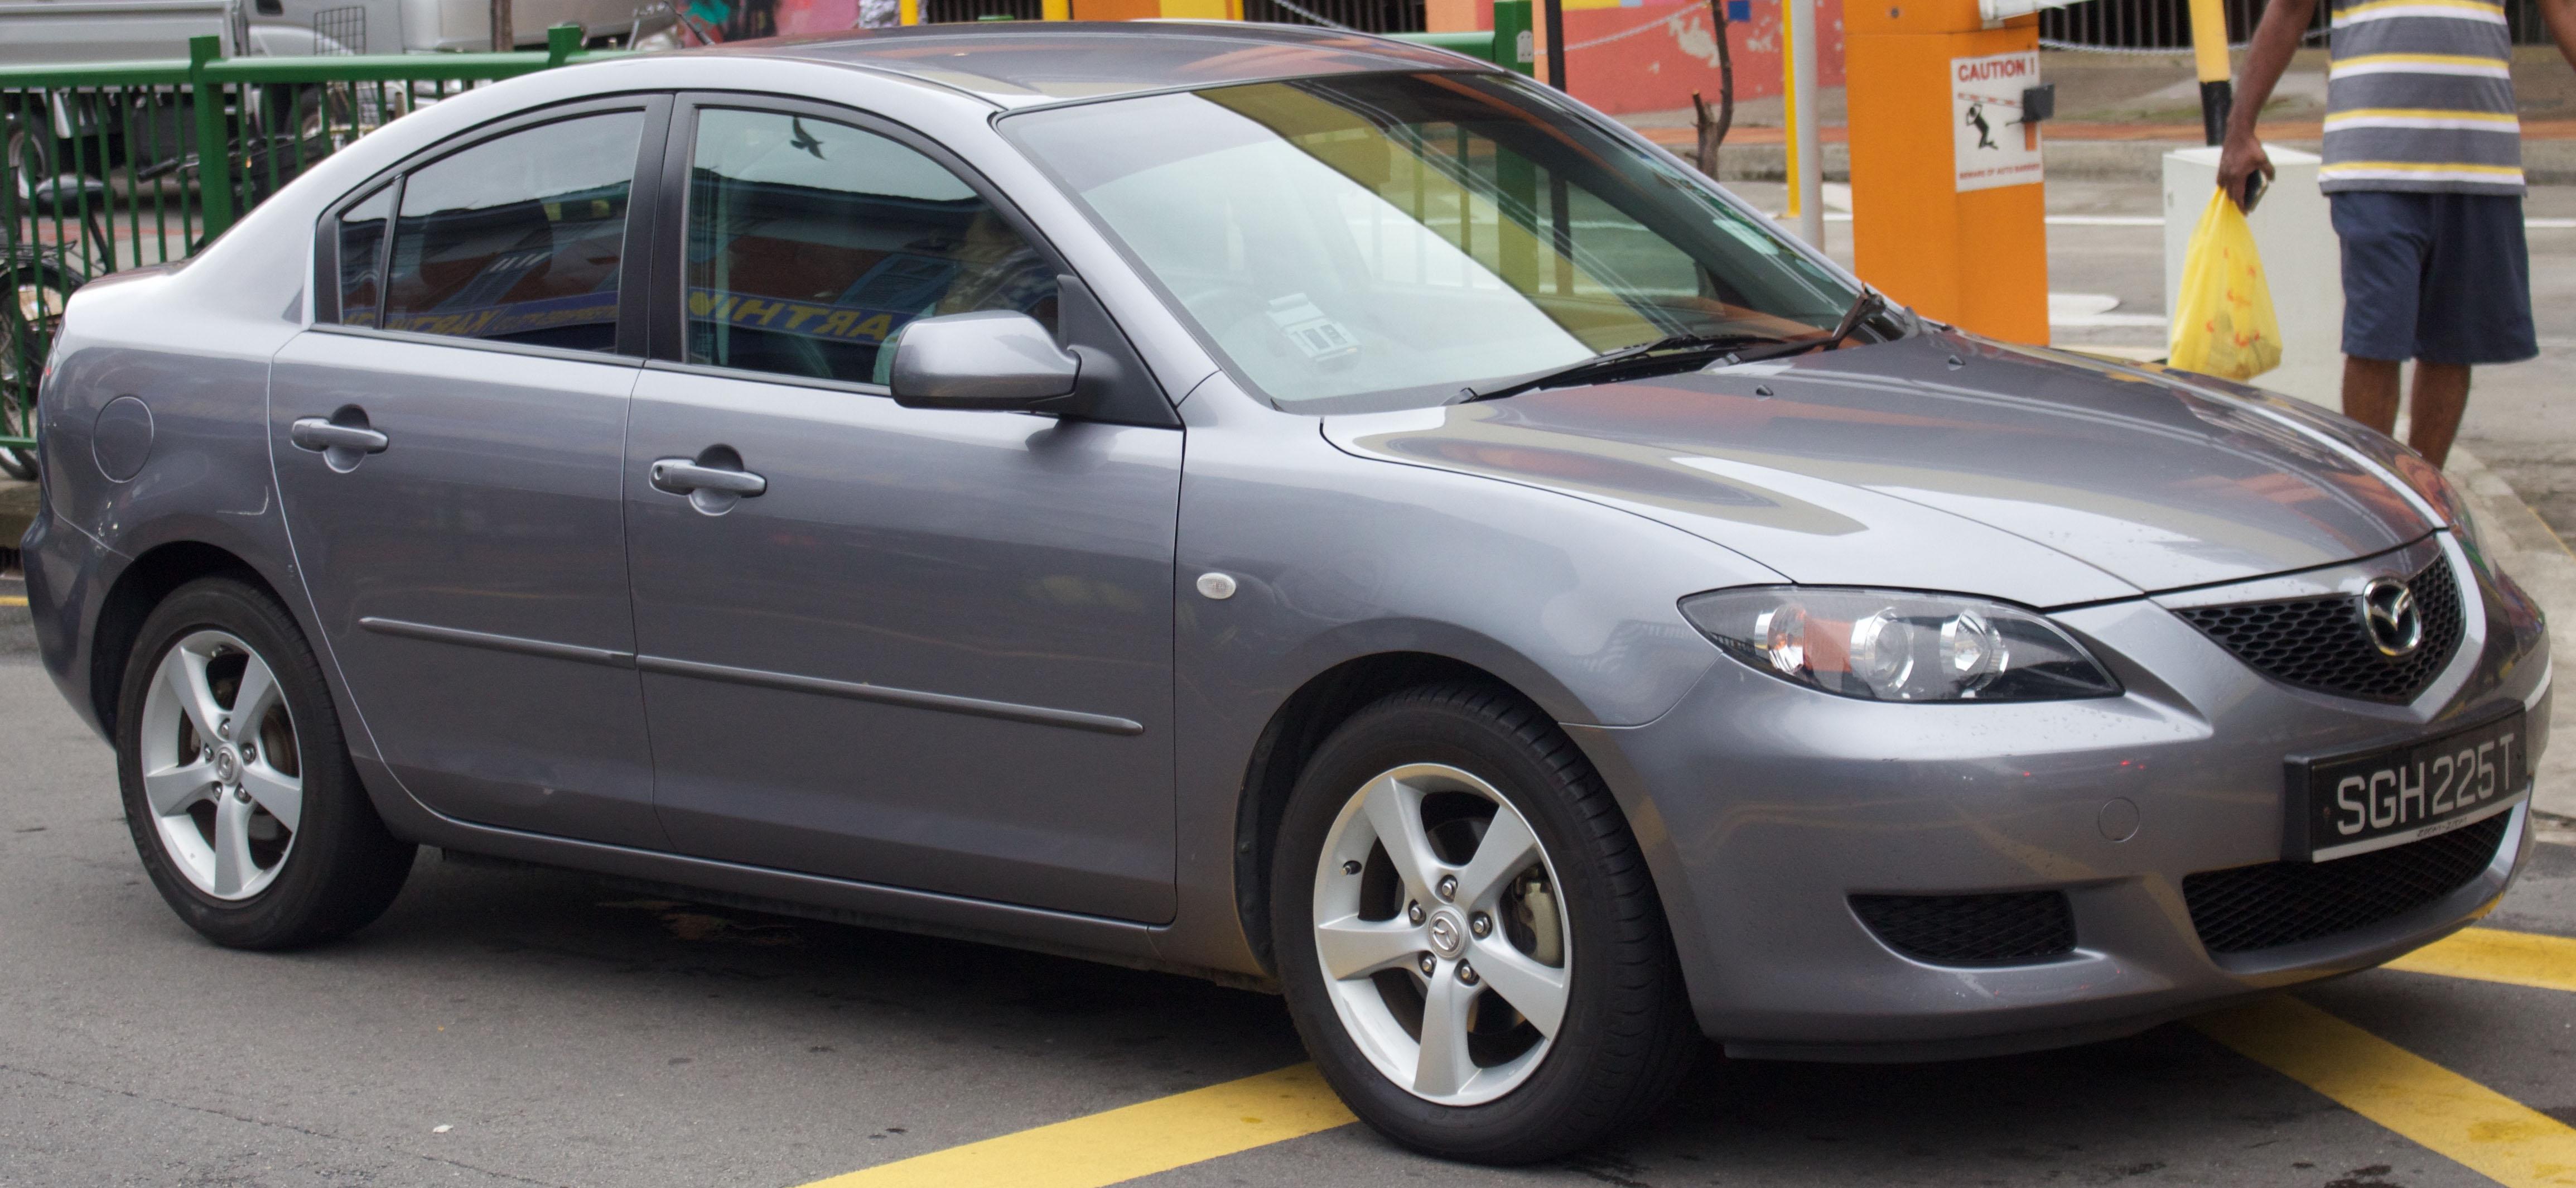 File 2006 Mazda 3 Bk 1 6 Luxury Sedan 2016 01 03 01 Jpg Wikimedia Commons